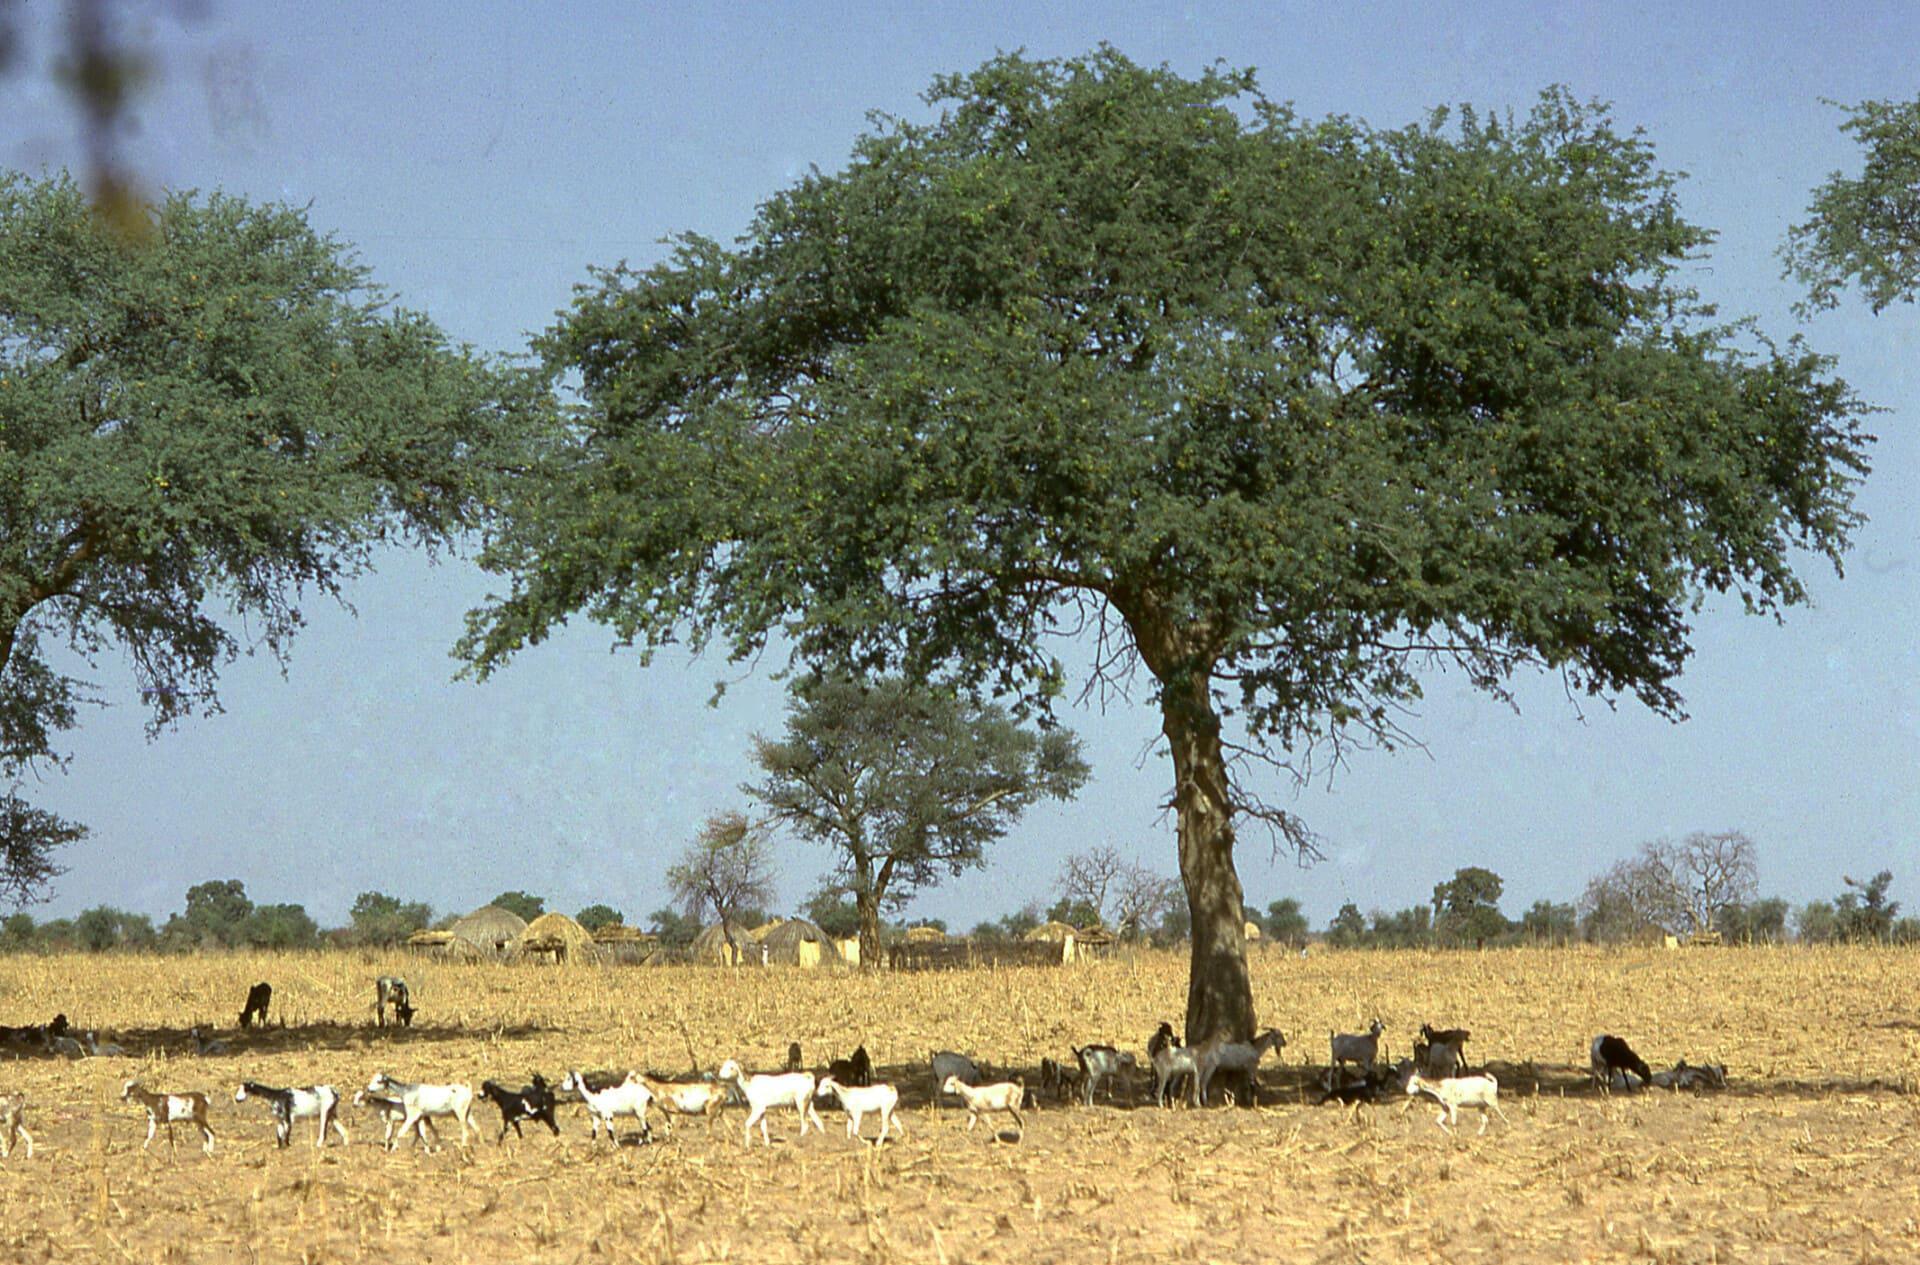 Dry season in Burkina Faso